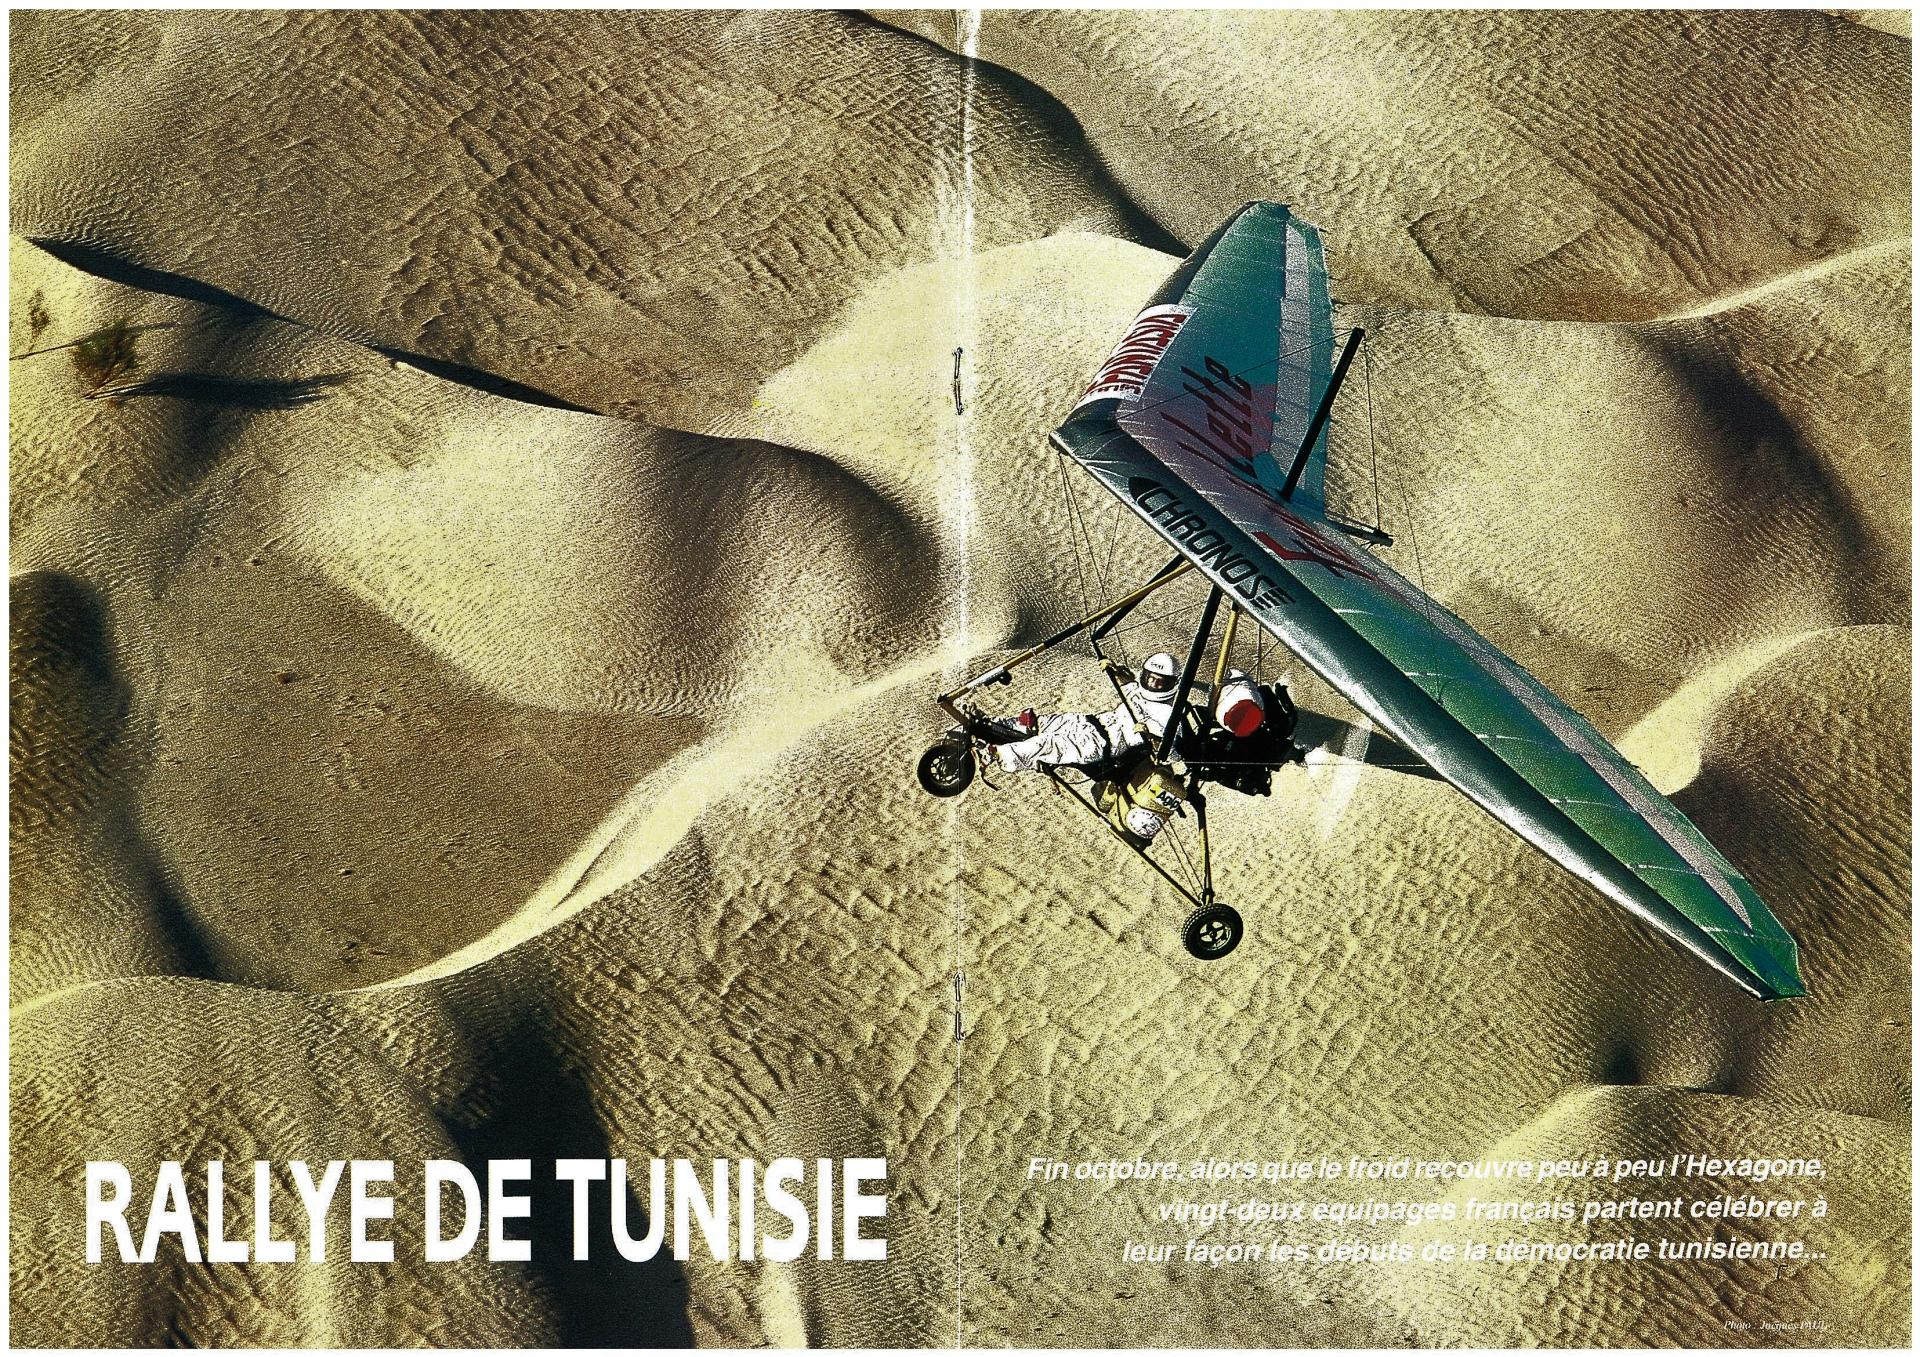 Rallye ulm tunisie 11